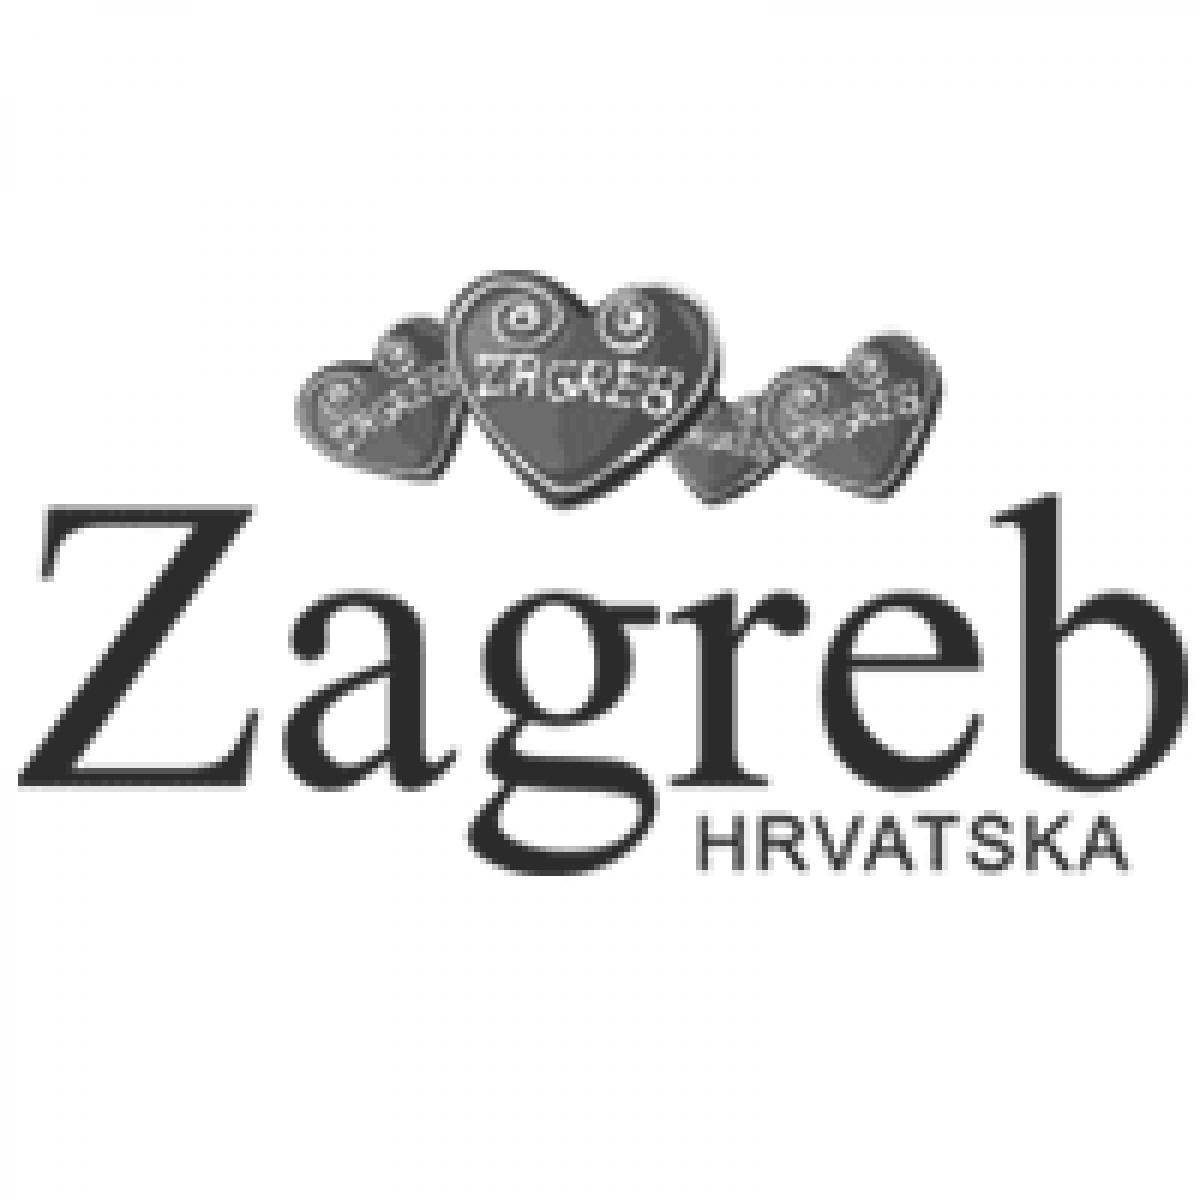 Bilbord za kompaniju TZG